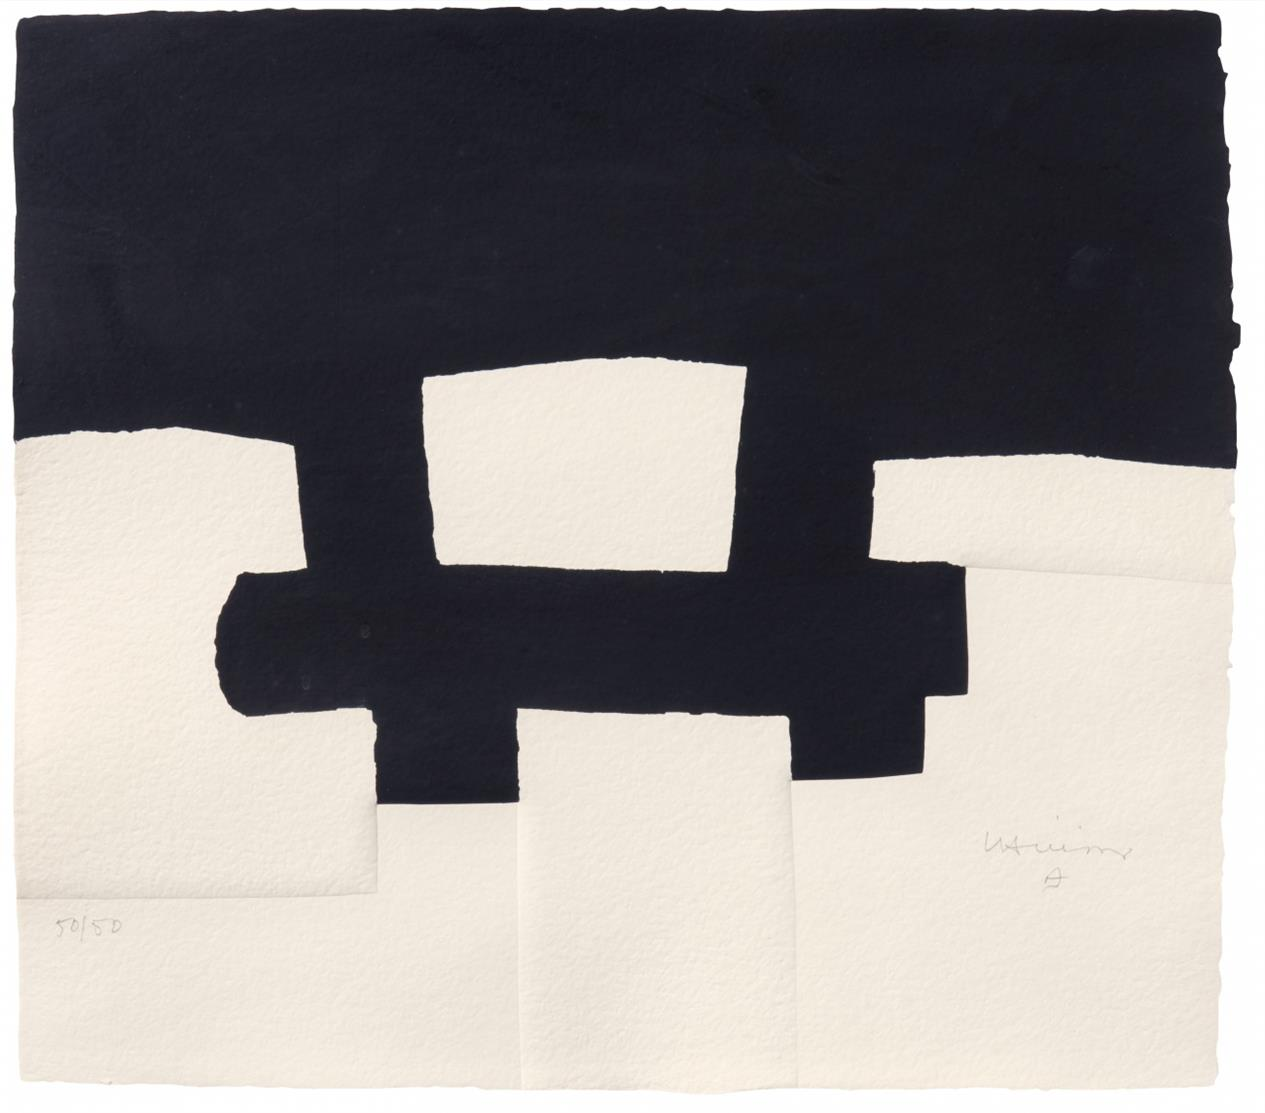 Eduardo Chillida. Berlin. 1990. Serigraphie mit Prägedruck. Signiert. Ex. 50/50. V.d.K. 90014.